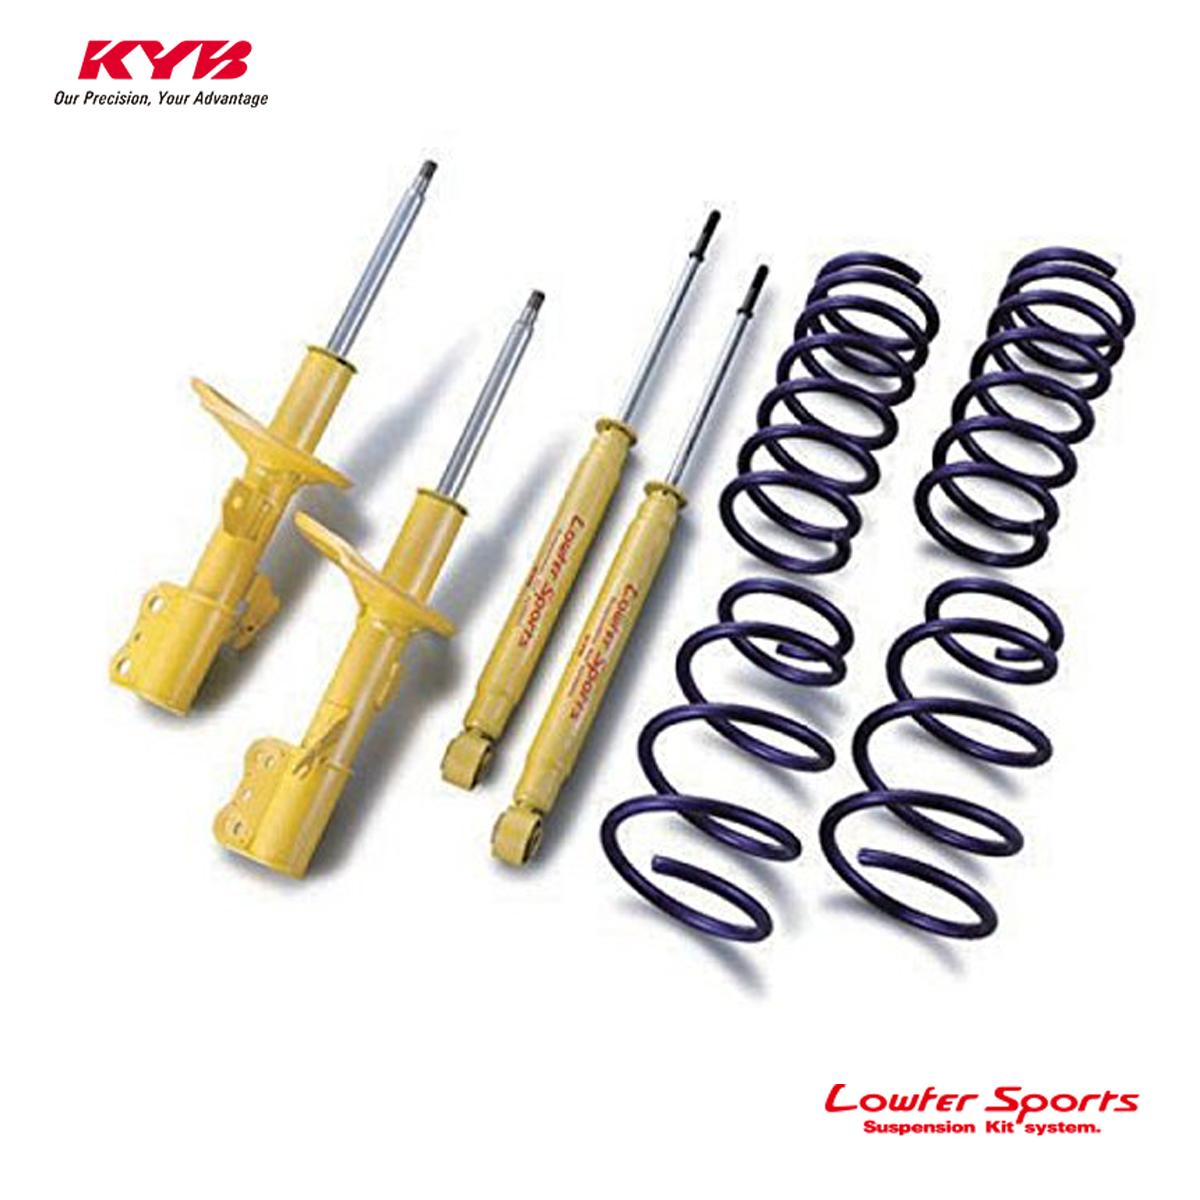 KYB カヤバ MRワゴン MF21S ショックアブソーバー サスペンションキット Lowfer Sports LKIT-MF21S 配送先条件有り